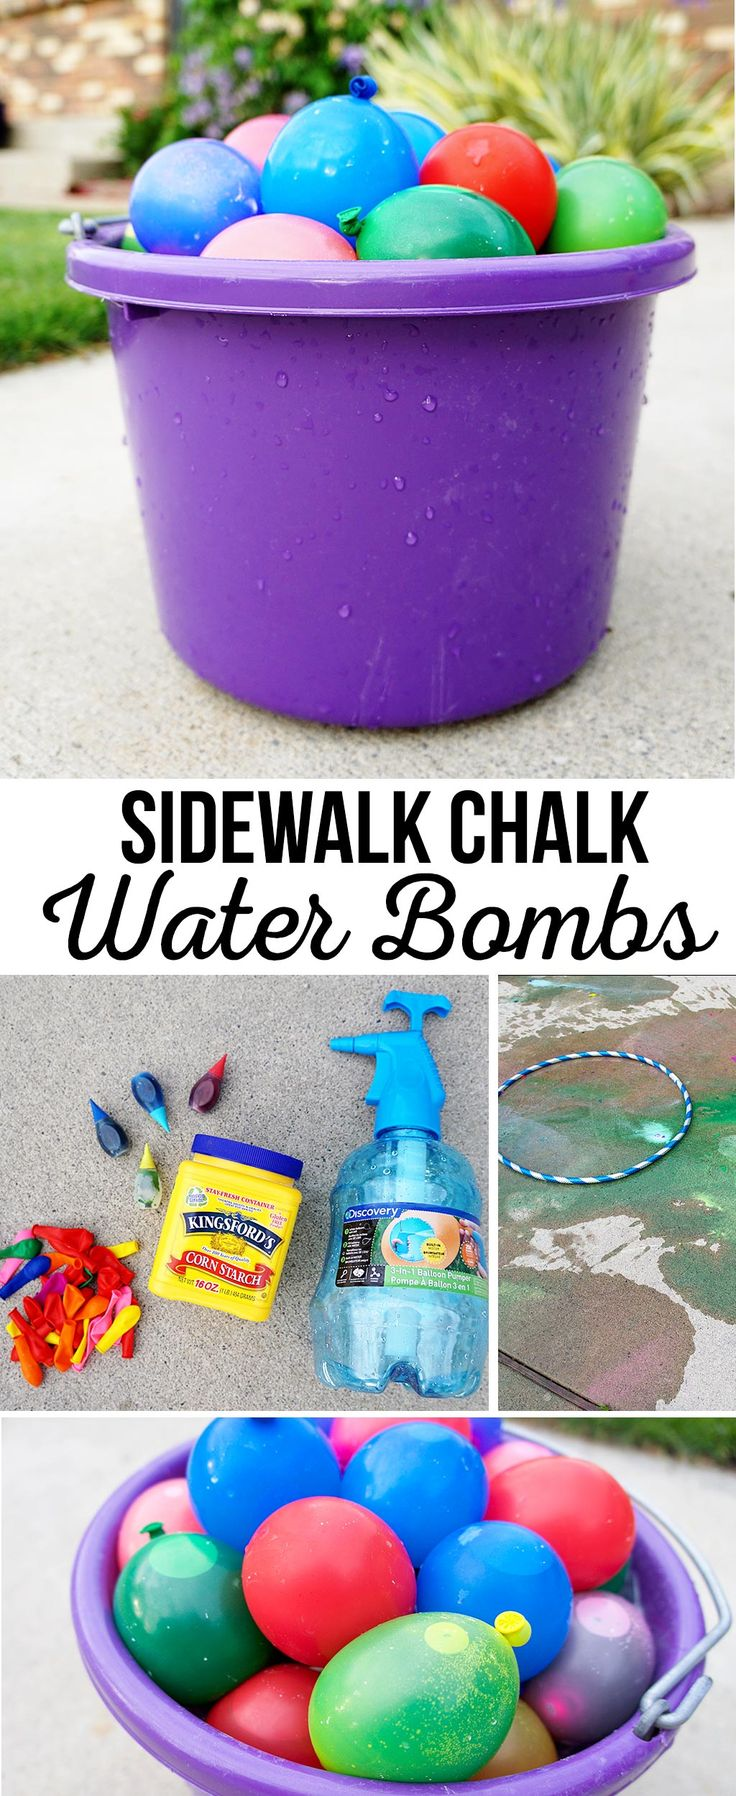 DIY Sidewalk Chalk Water Bombs   Summer Kids Activities